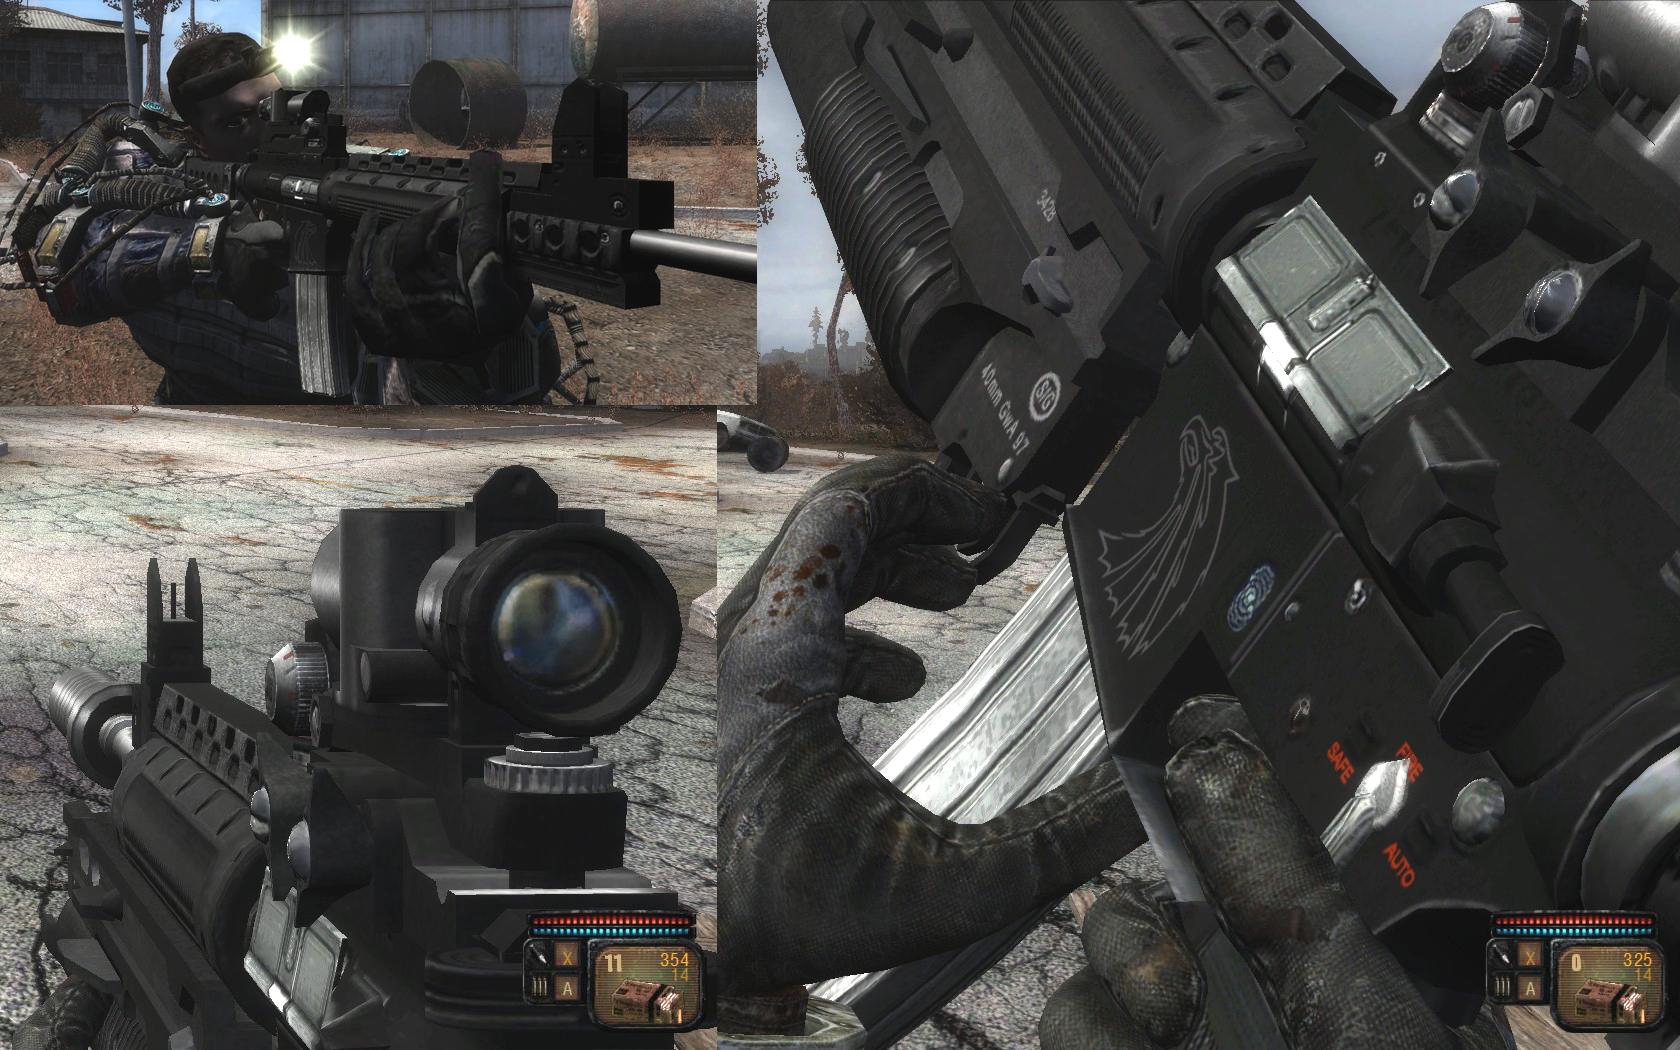 AK74 replacement | S.T.A.L.K.E.R.: Call of Pripyat Skin Mods